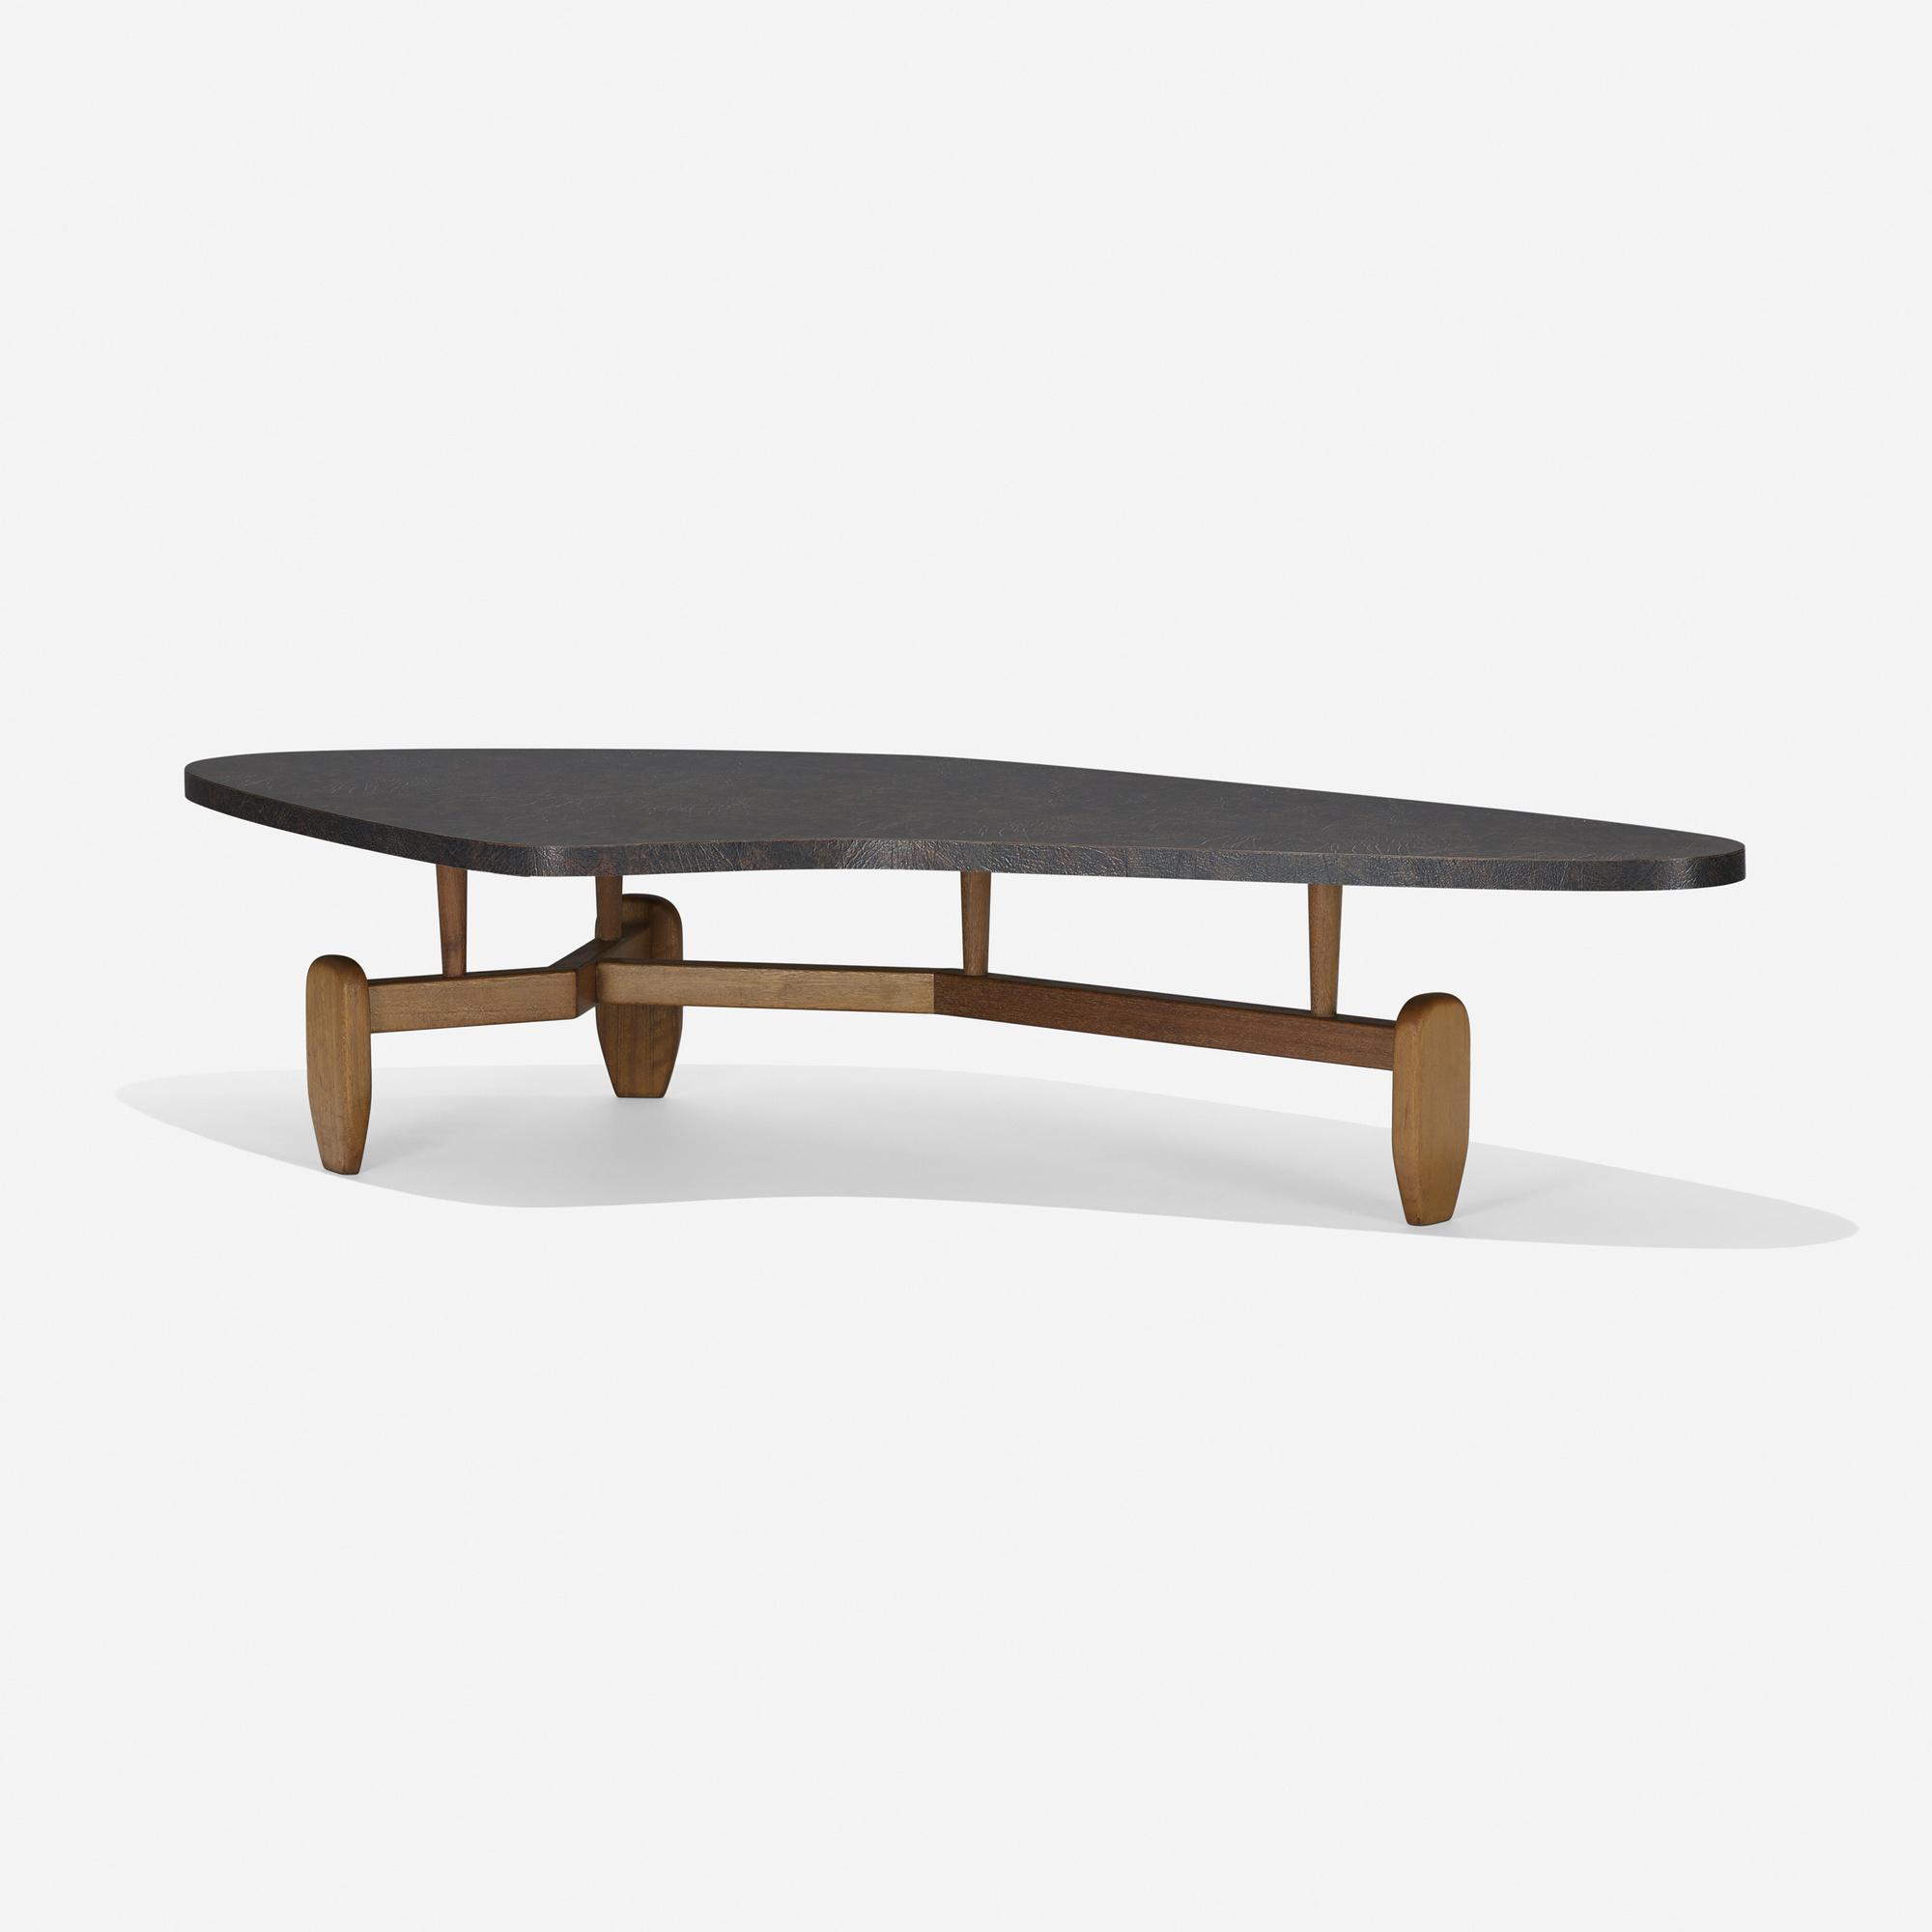 332 John Keal coffee table American Design 10 September 2015